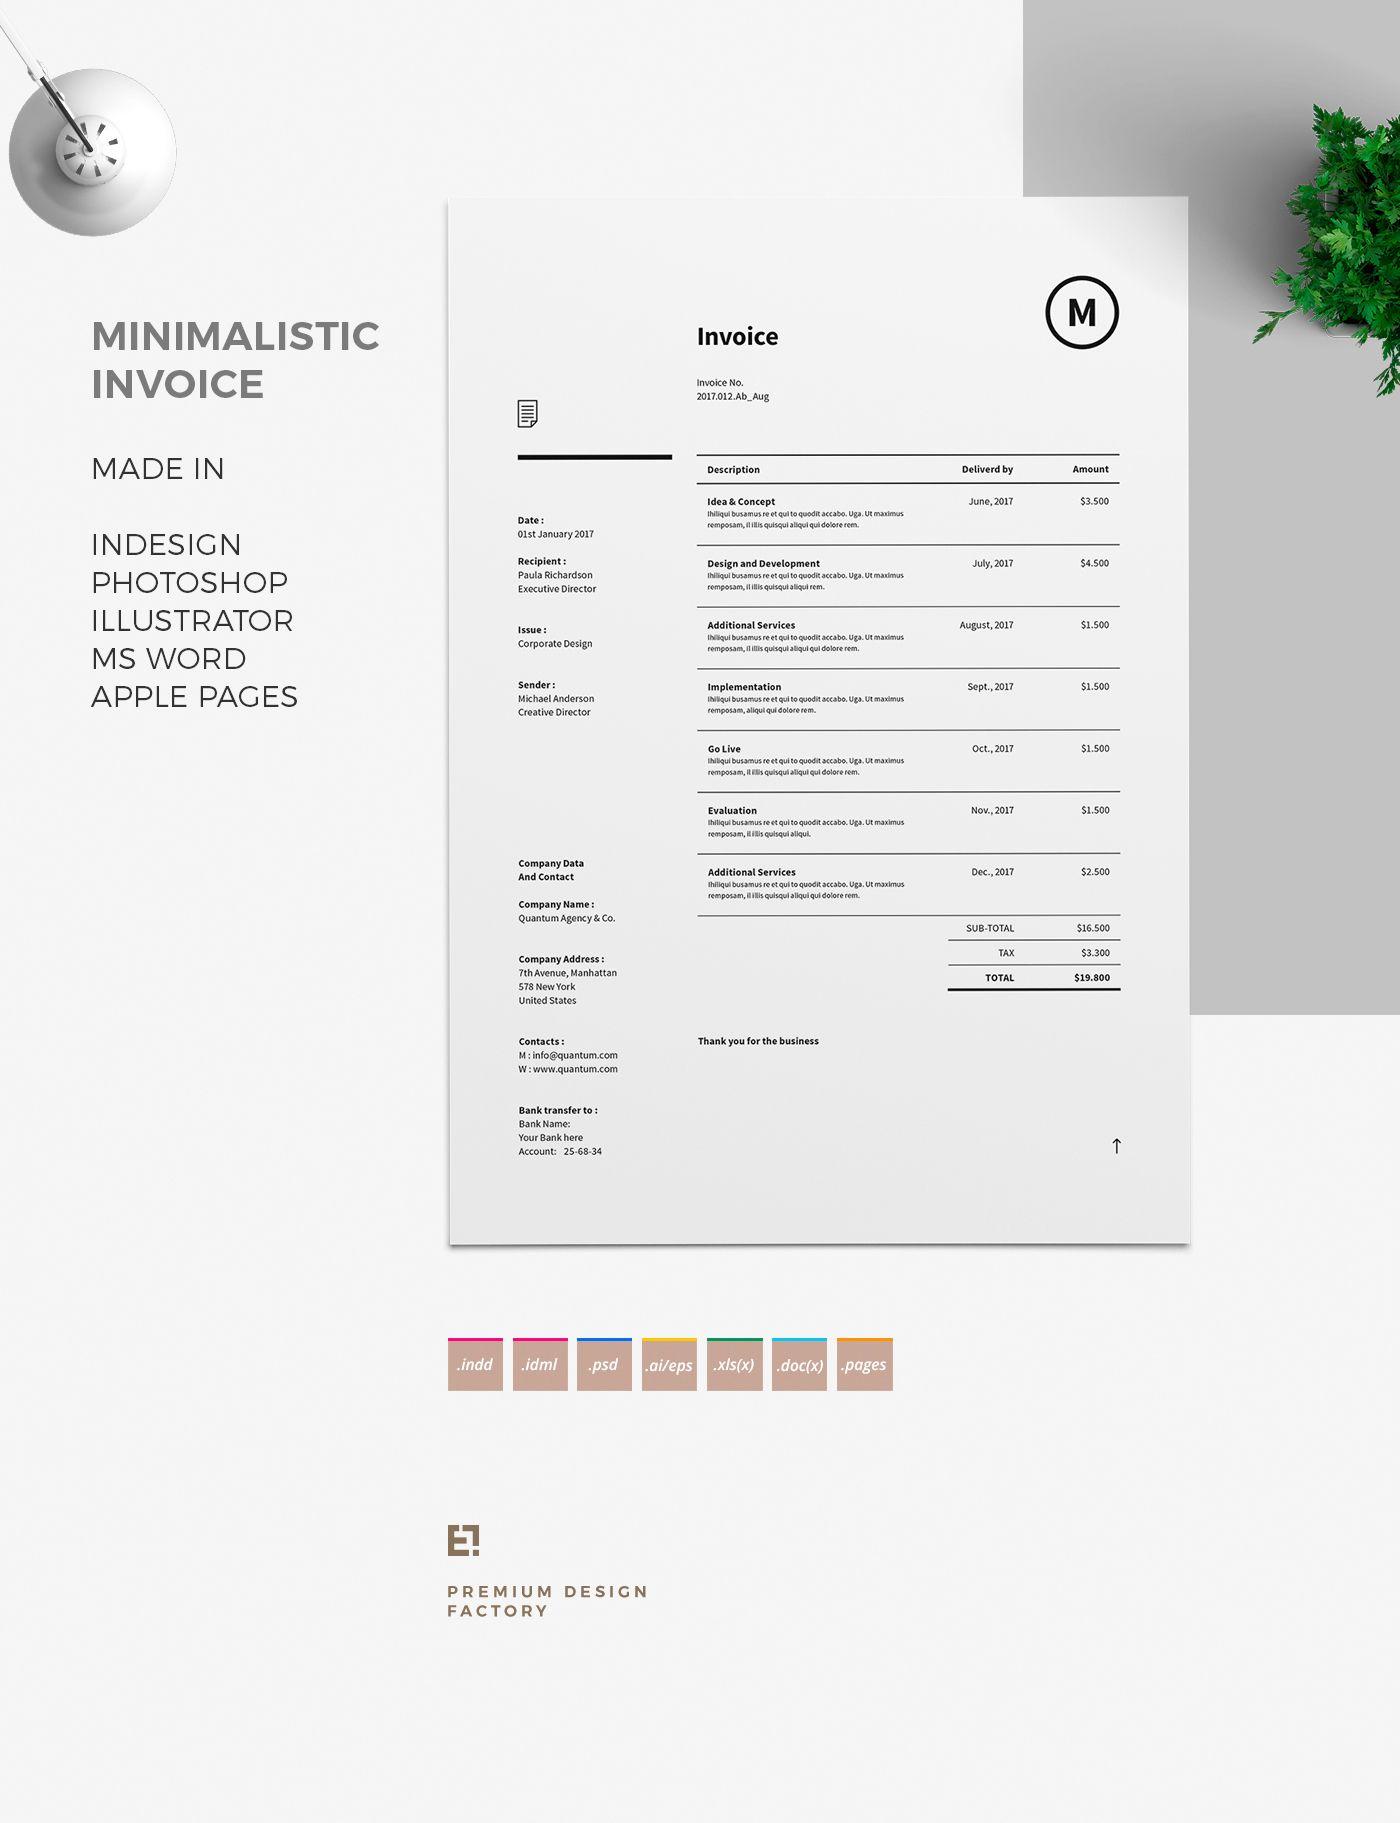 3195c148005695.588b6afc43dad.jpg (1400×1823) | Business | Pinterest ...